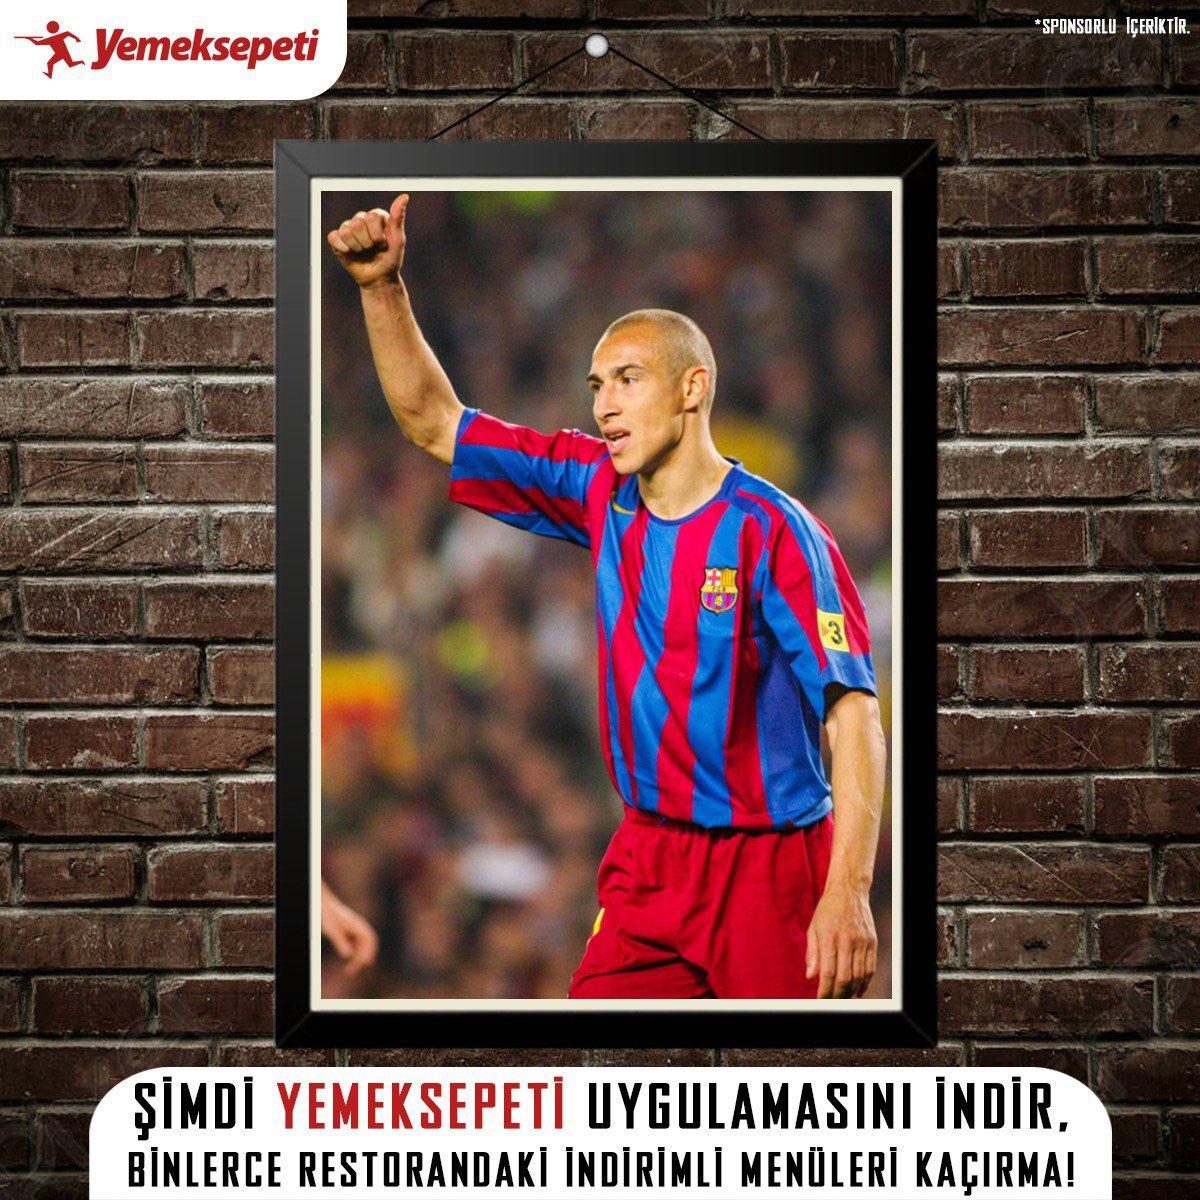 🌟 Henrik Larsson  🇸🇪 Uyruk: İsveç ⚽️ Mevki: Forvet 👕 Kulüpleri: Helsingborg, Feyenoord, Celtic, Barcelona, Man Utd 📆 Yıl: 1988-2009  🏟 449 Maç ⚽️ 171 Gol 🎯 55 Asist